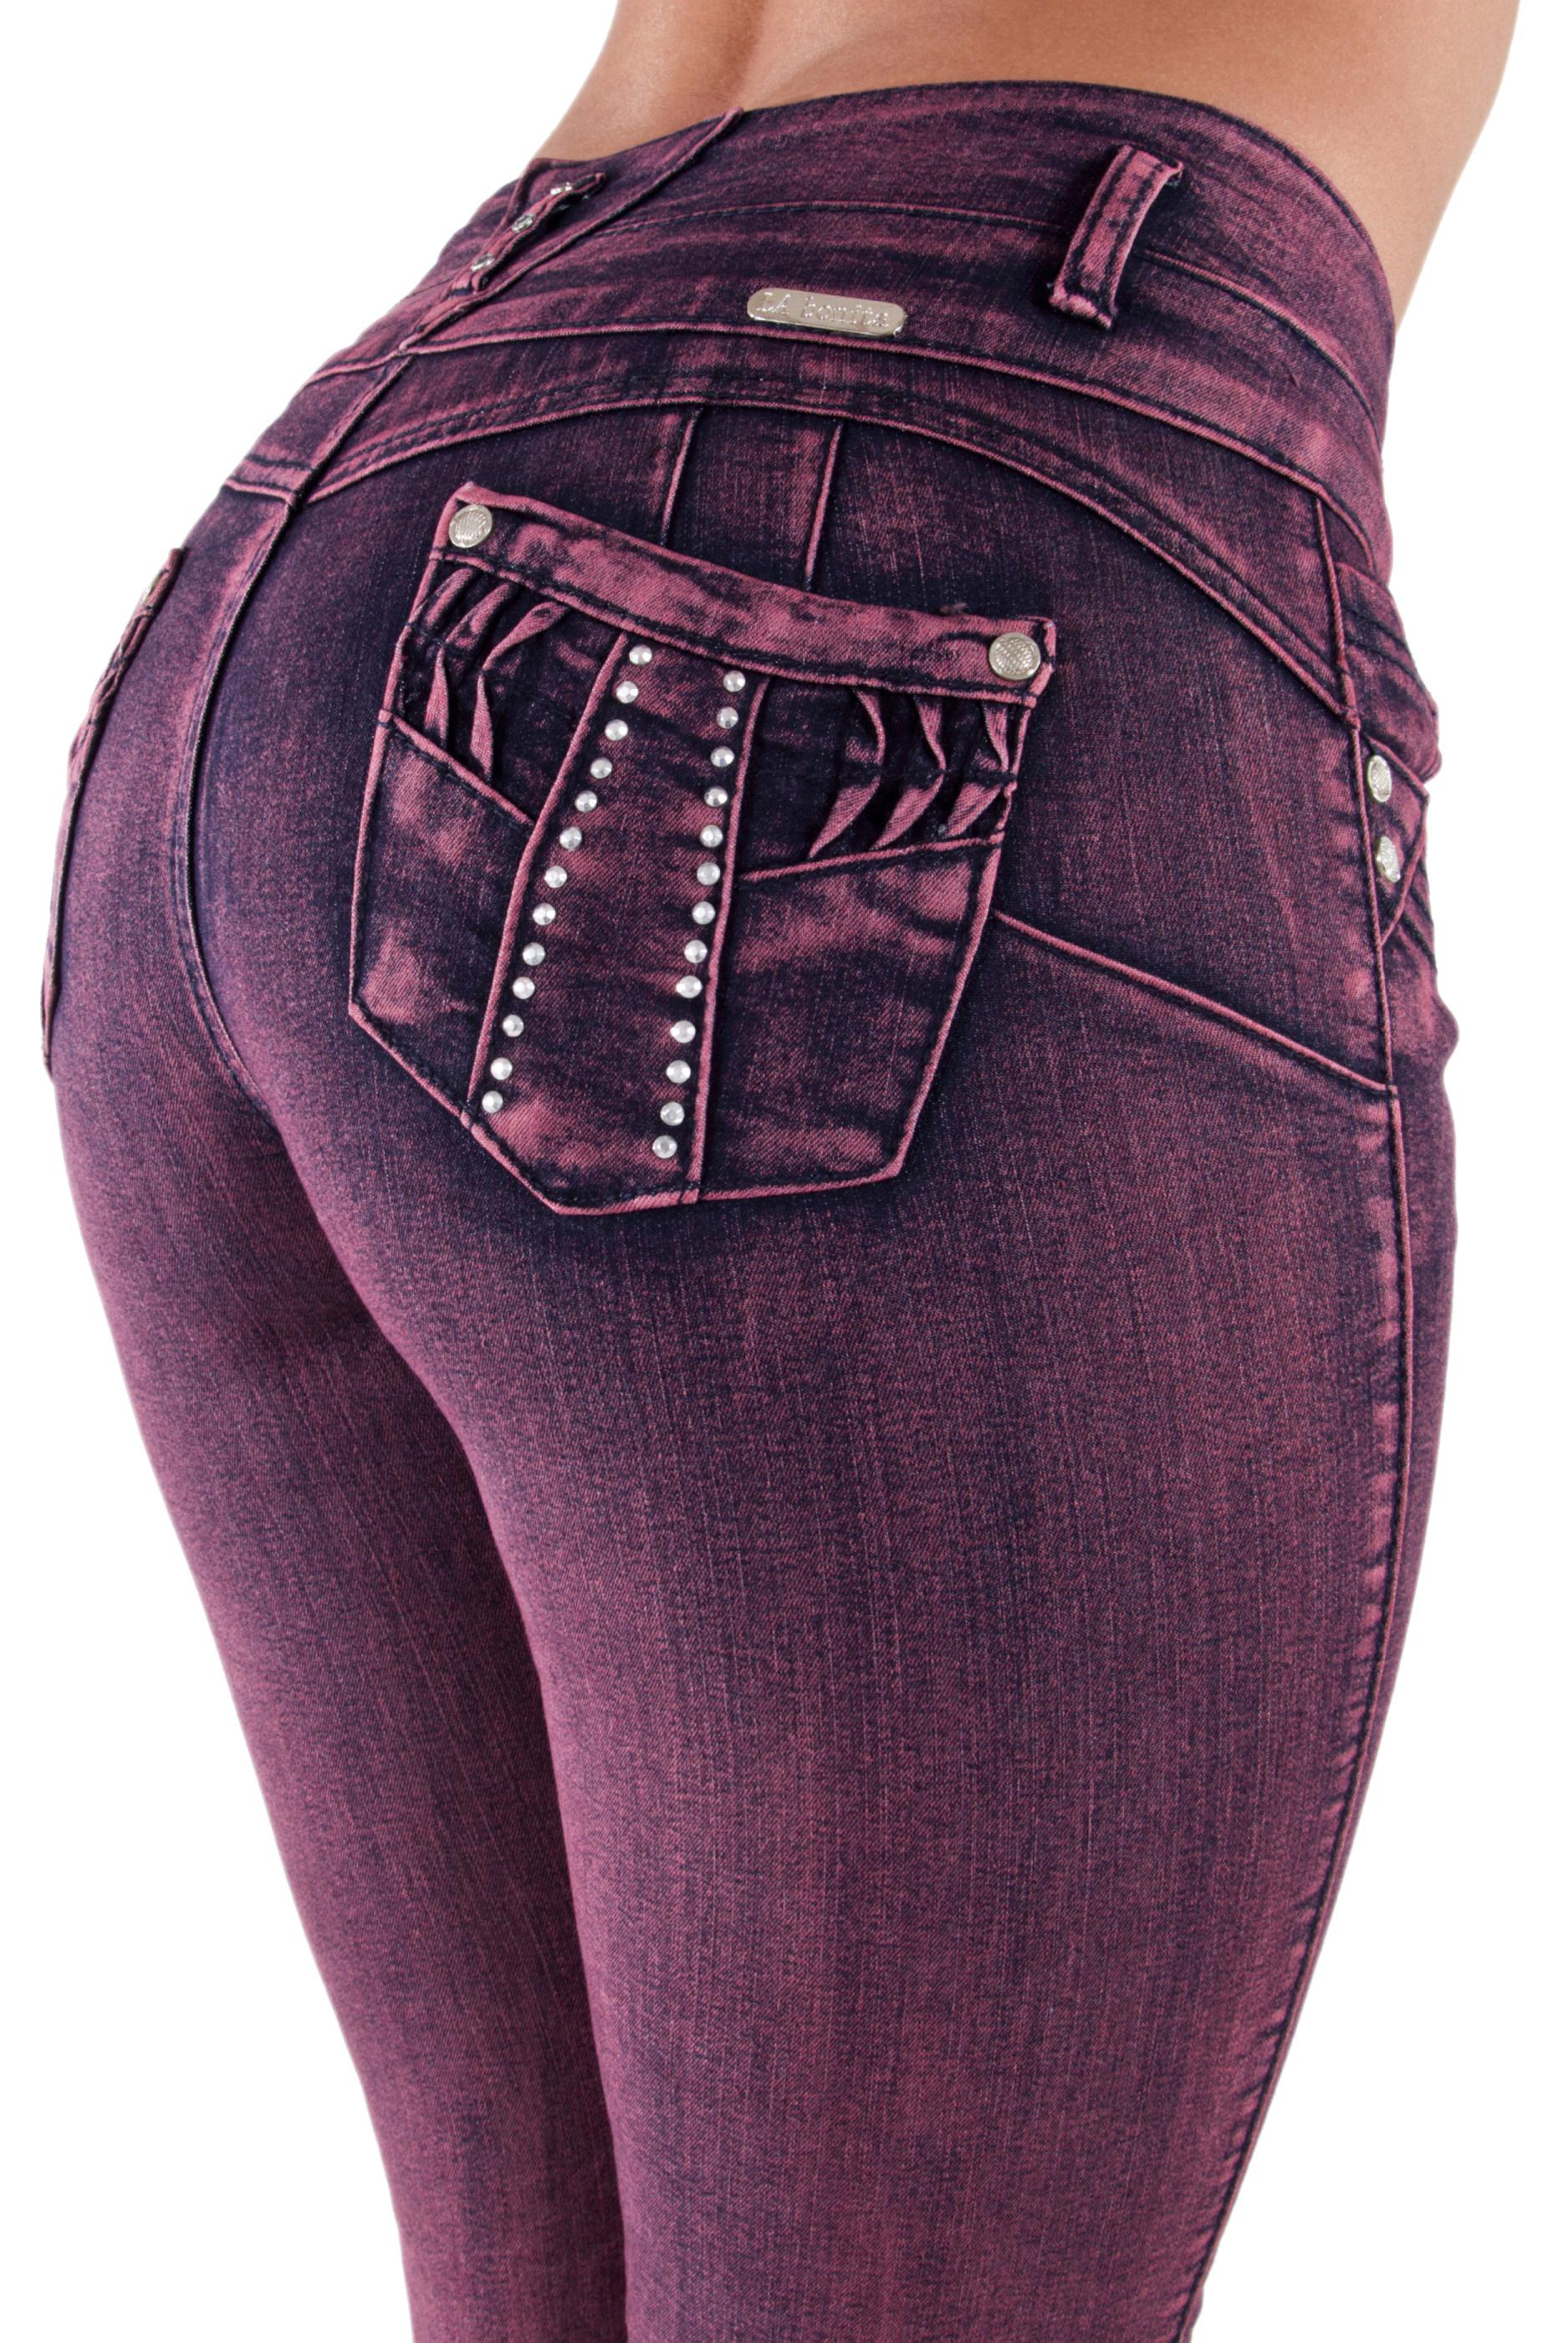 Plus-Junior-Size-Butt-Lift-Levanta-Cola-Skinny-Denim-Women-Jeans thumbnail 9